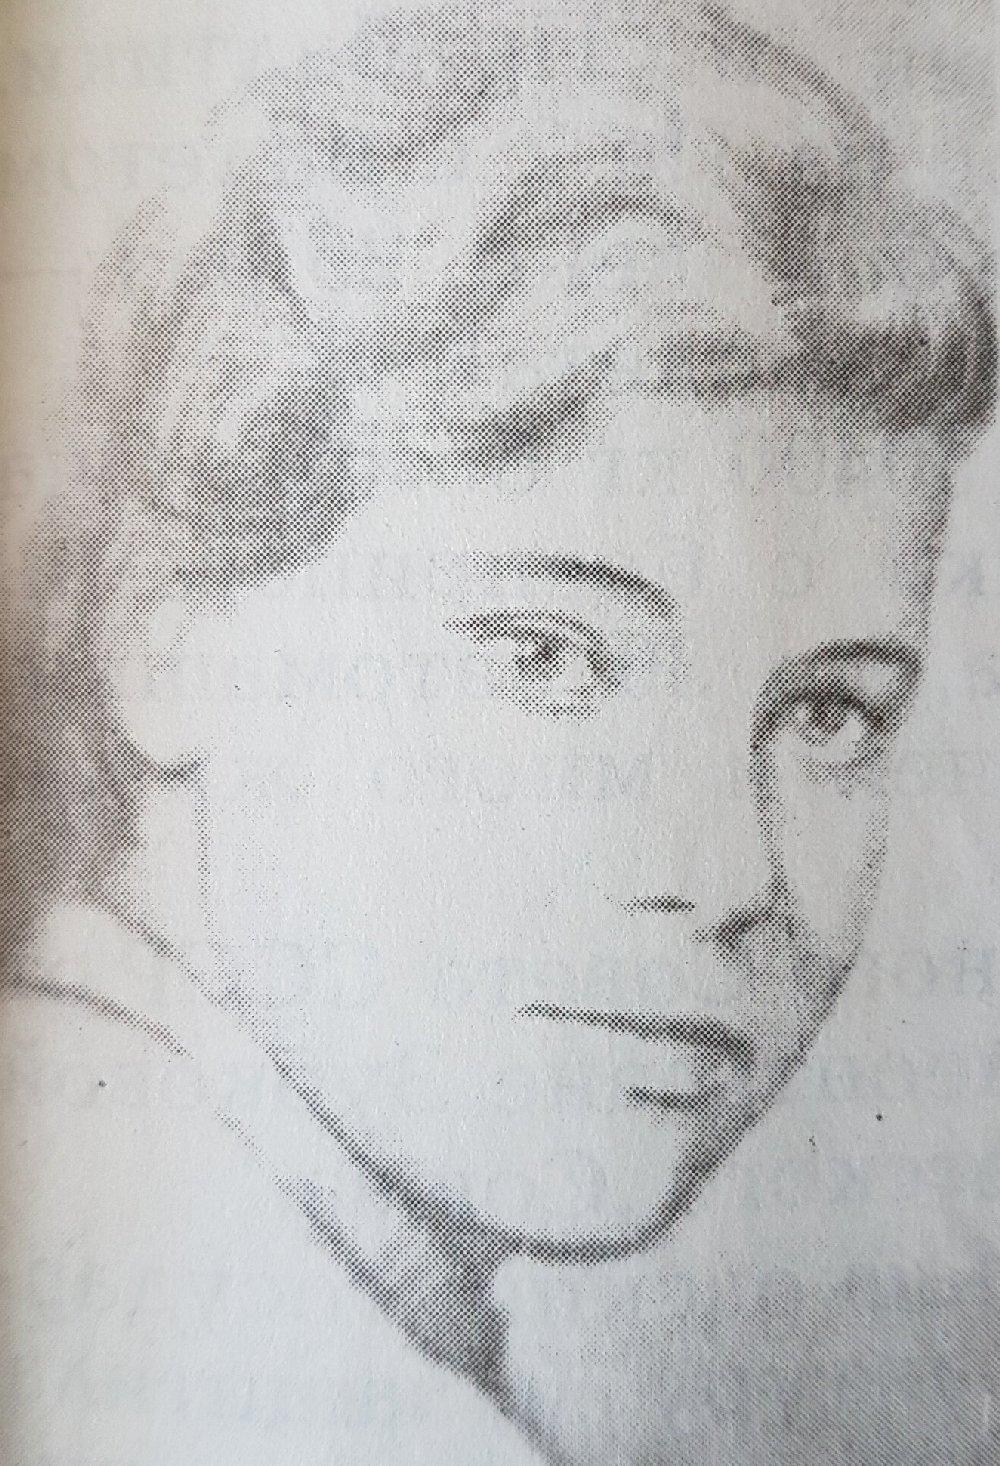 Герой Советского Союза Антонина Зубкова.